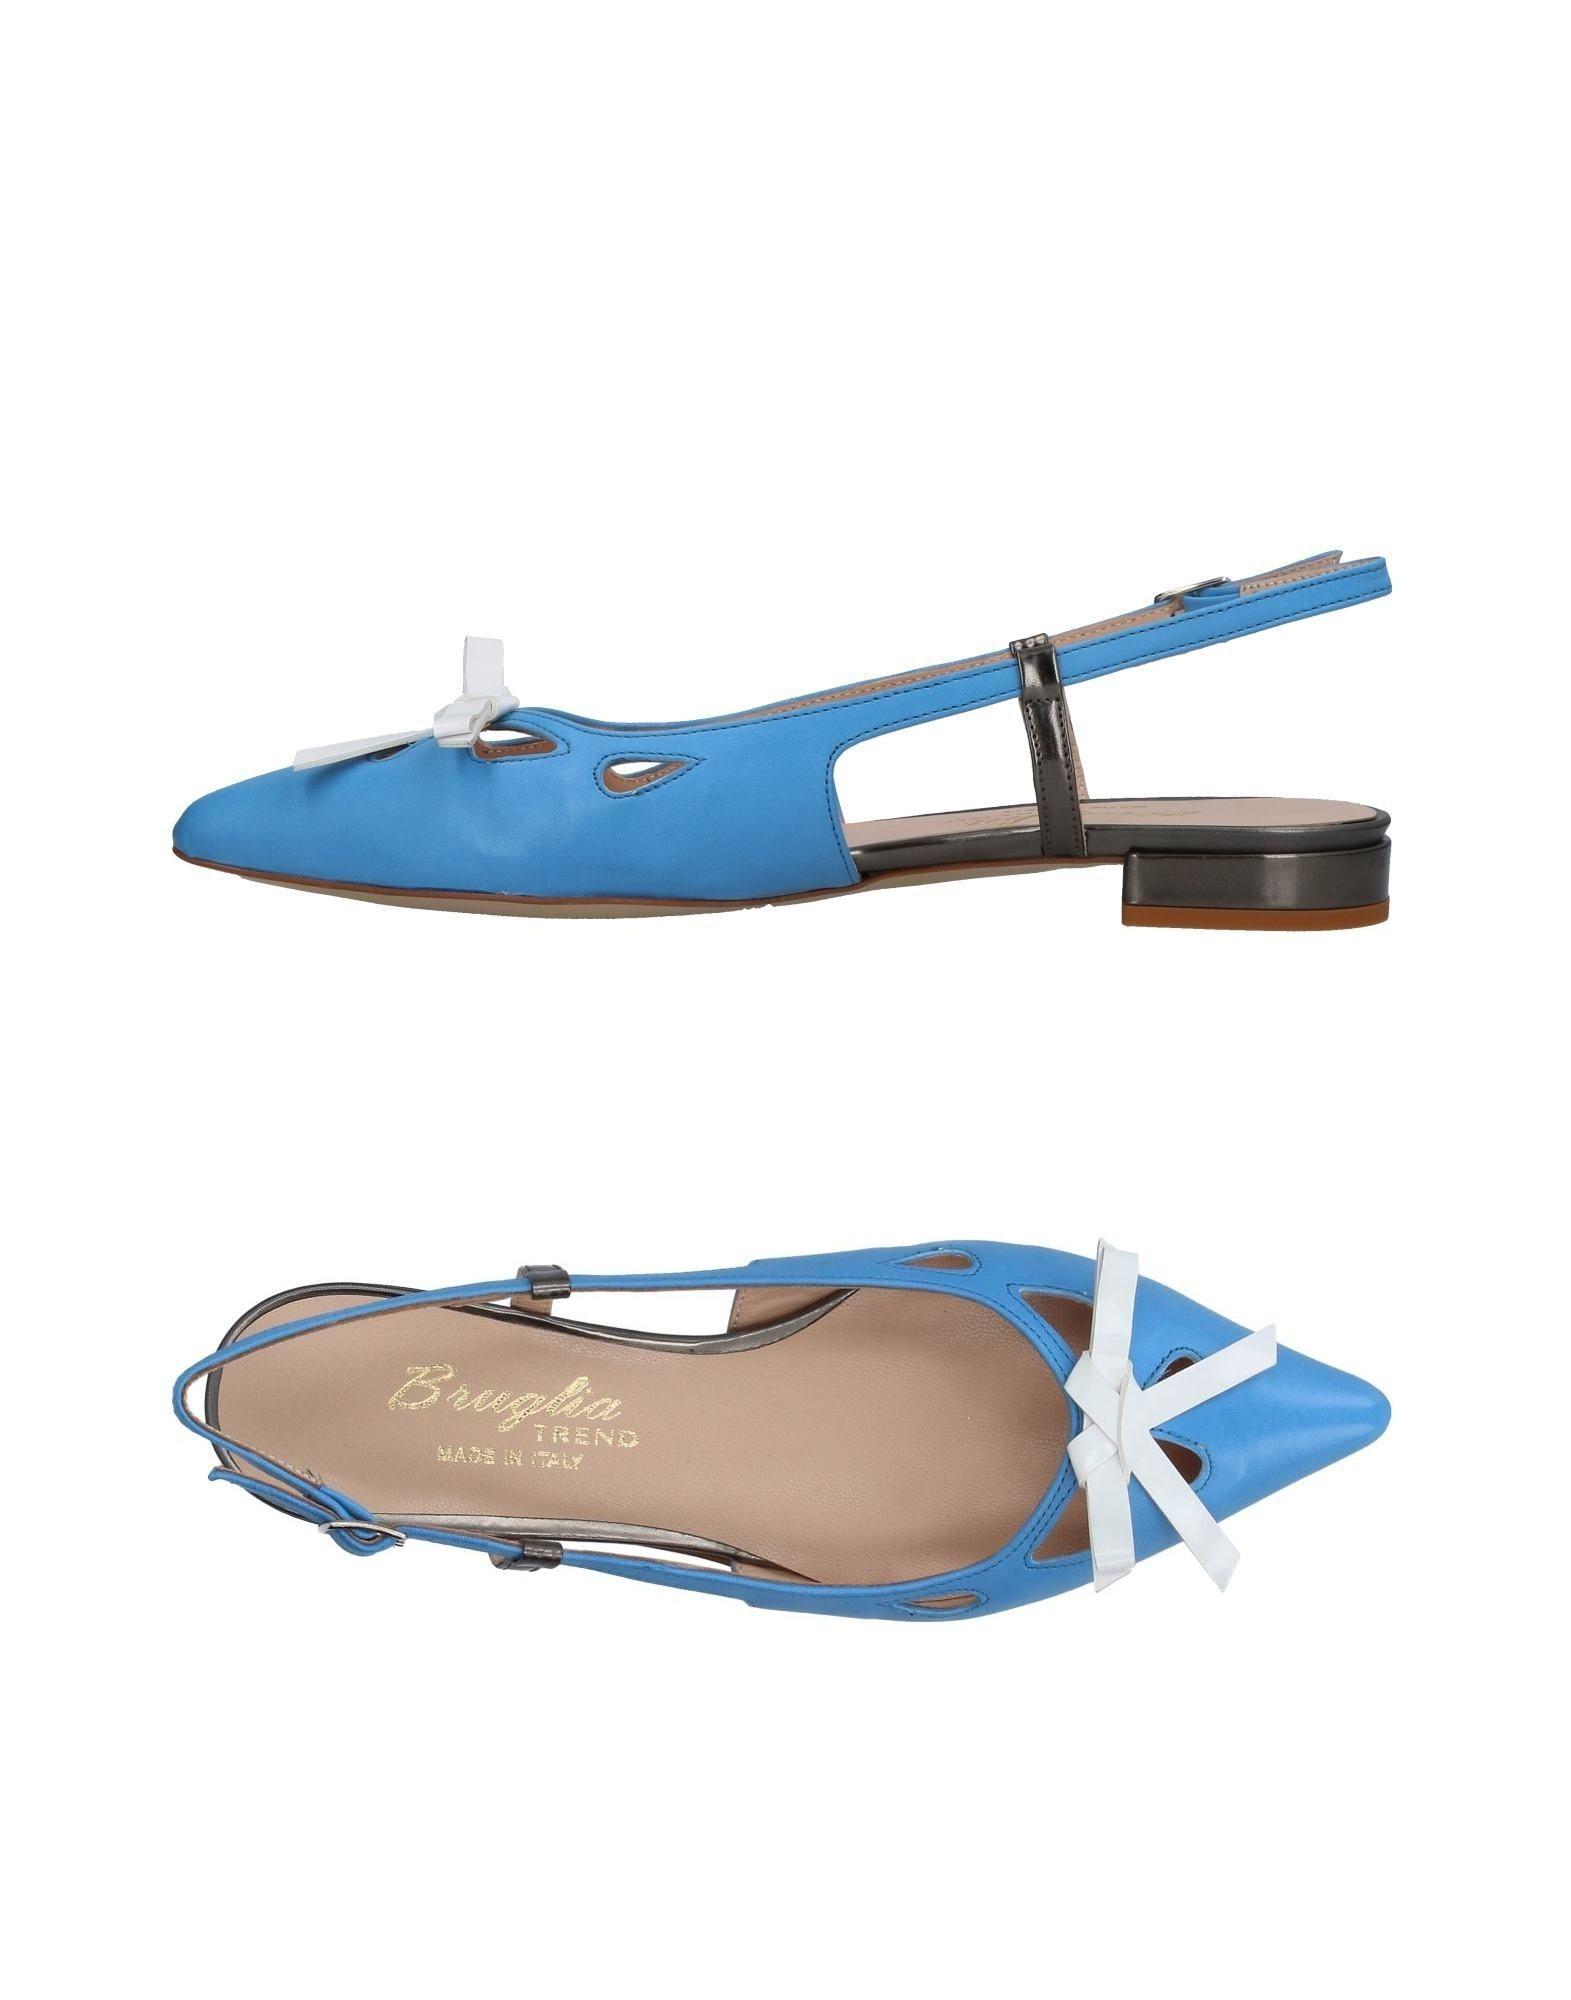 F.Lli Bruglia Ballerinas Damen  11408711GW Gute Qualität beliebte Schuhe